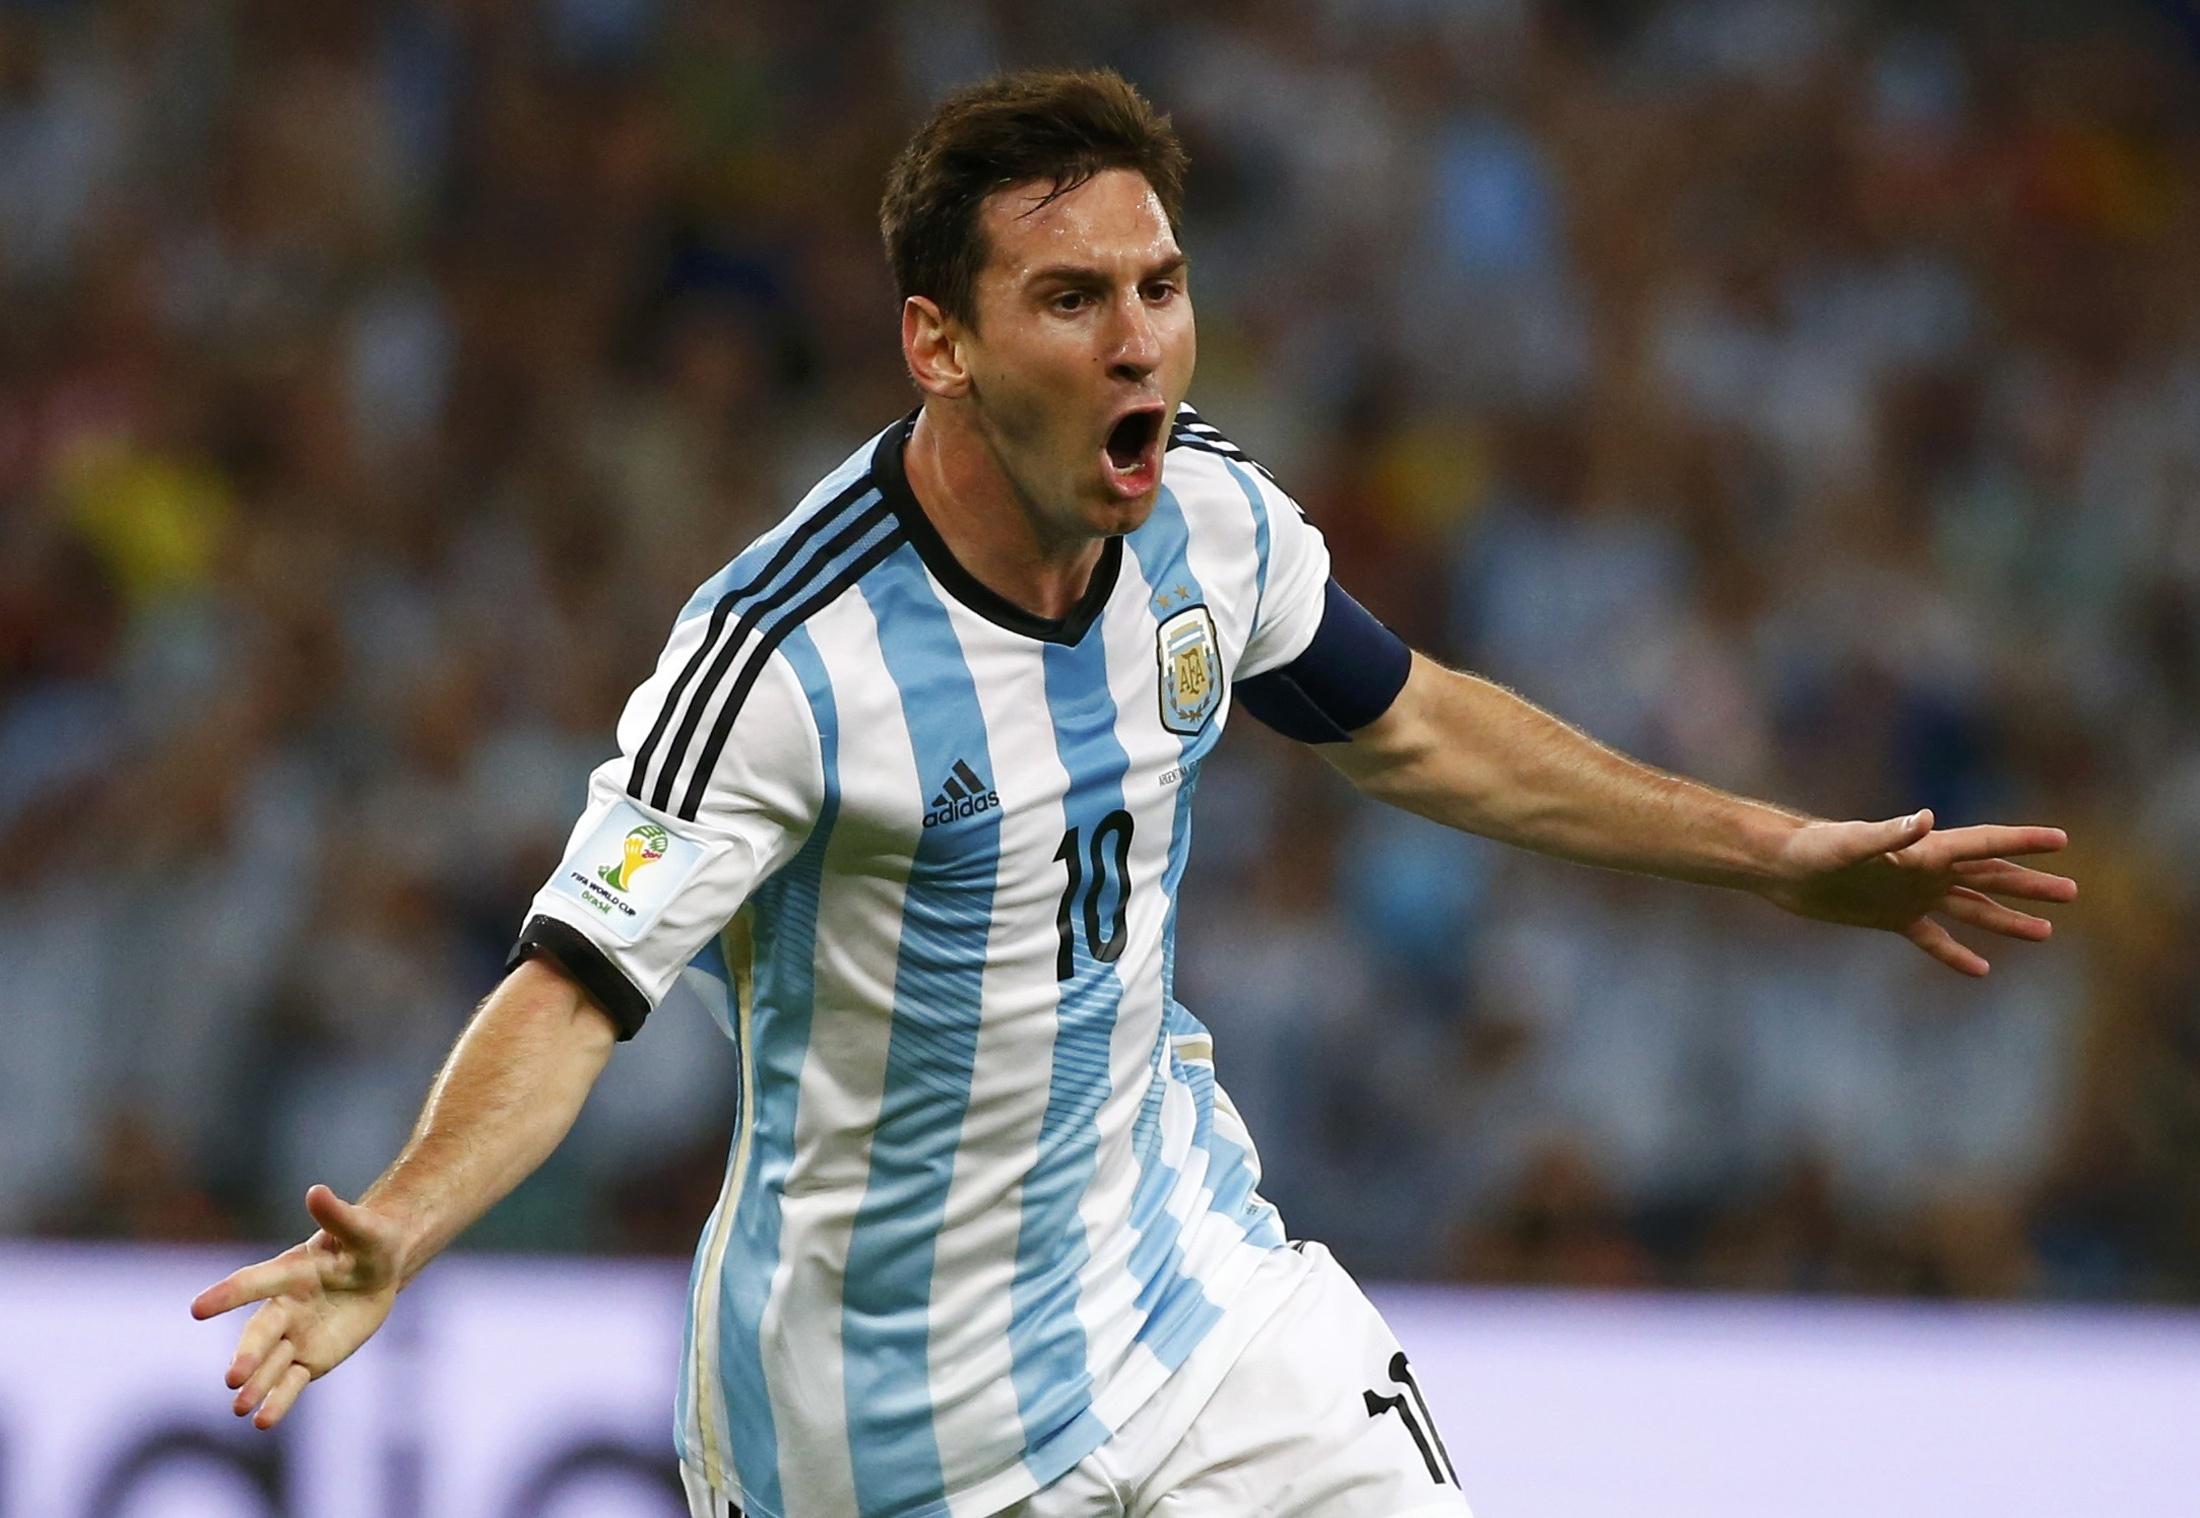 El Barcelona sondea la venta de Leo Messi